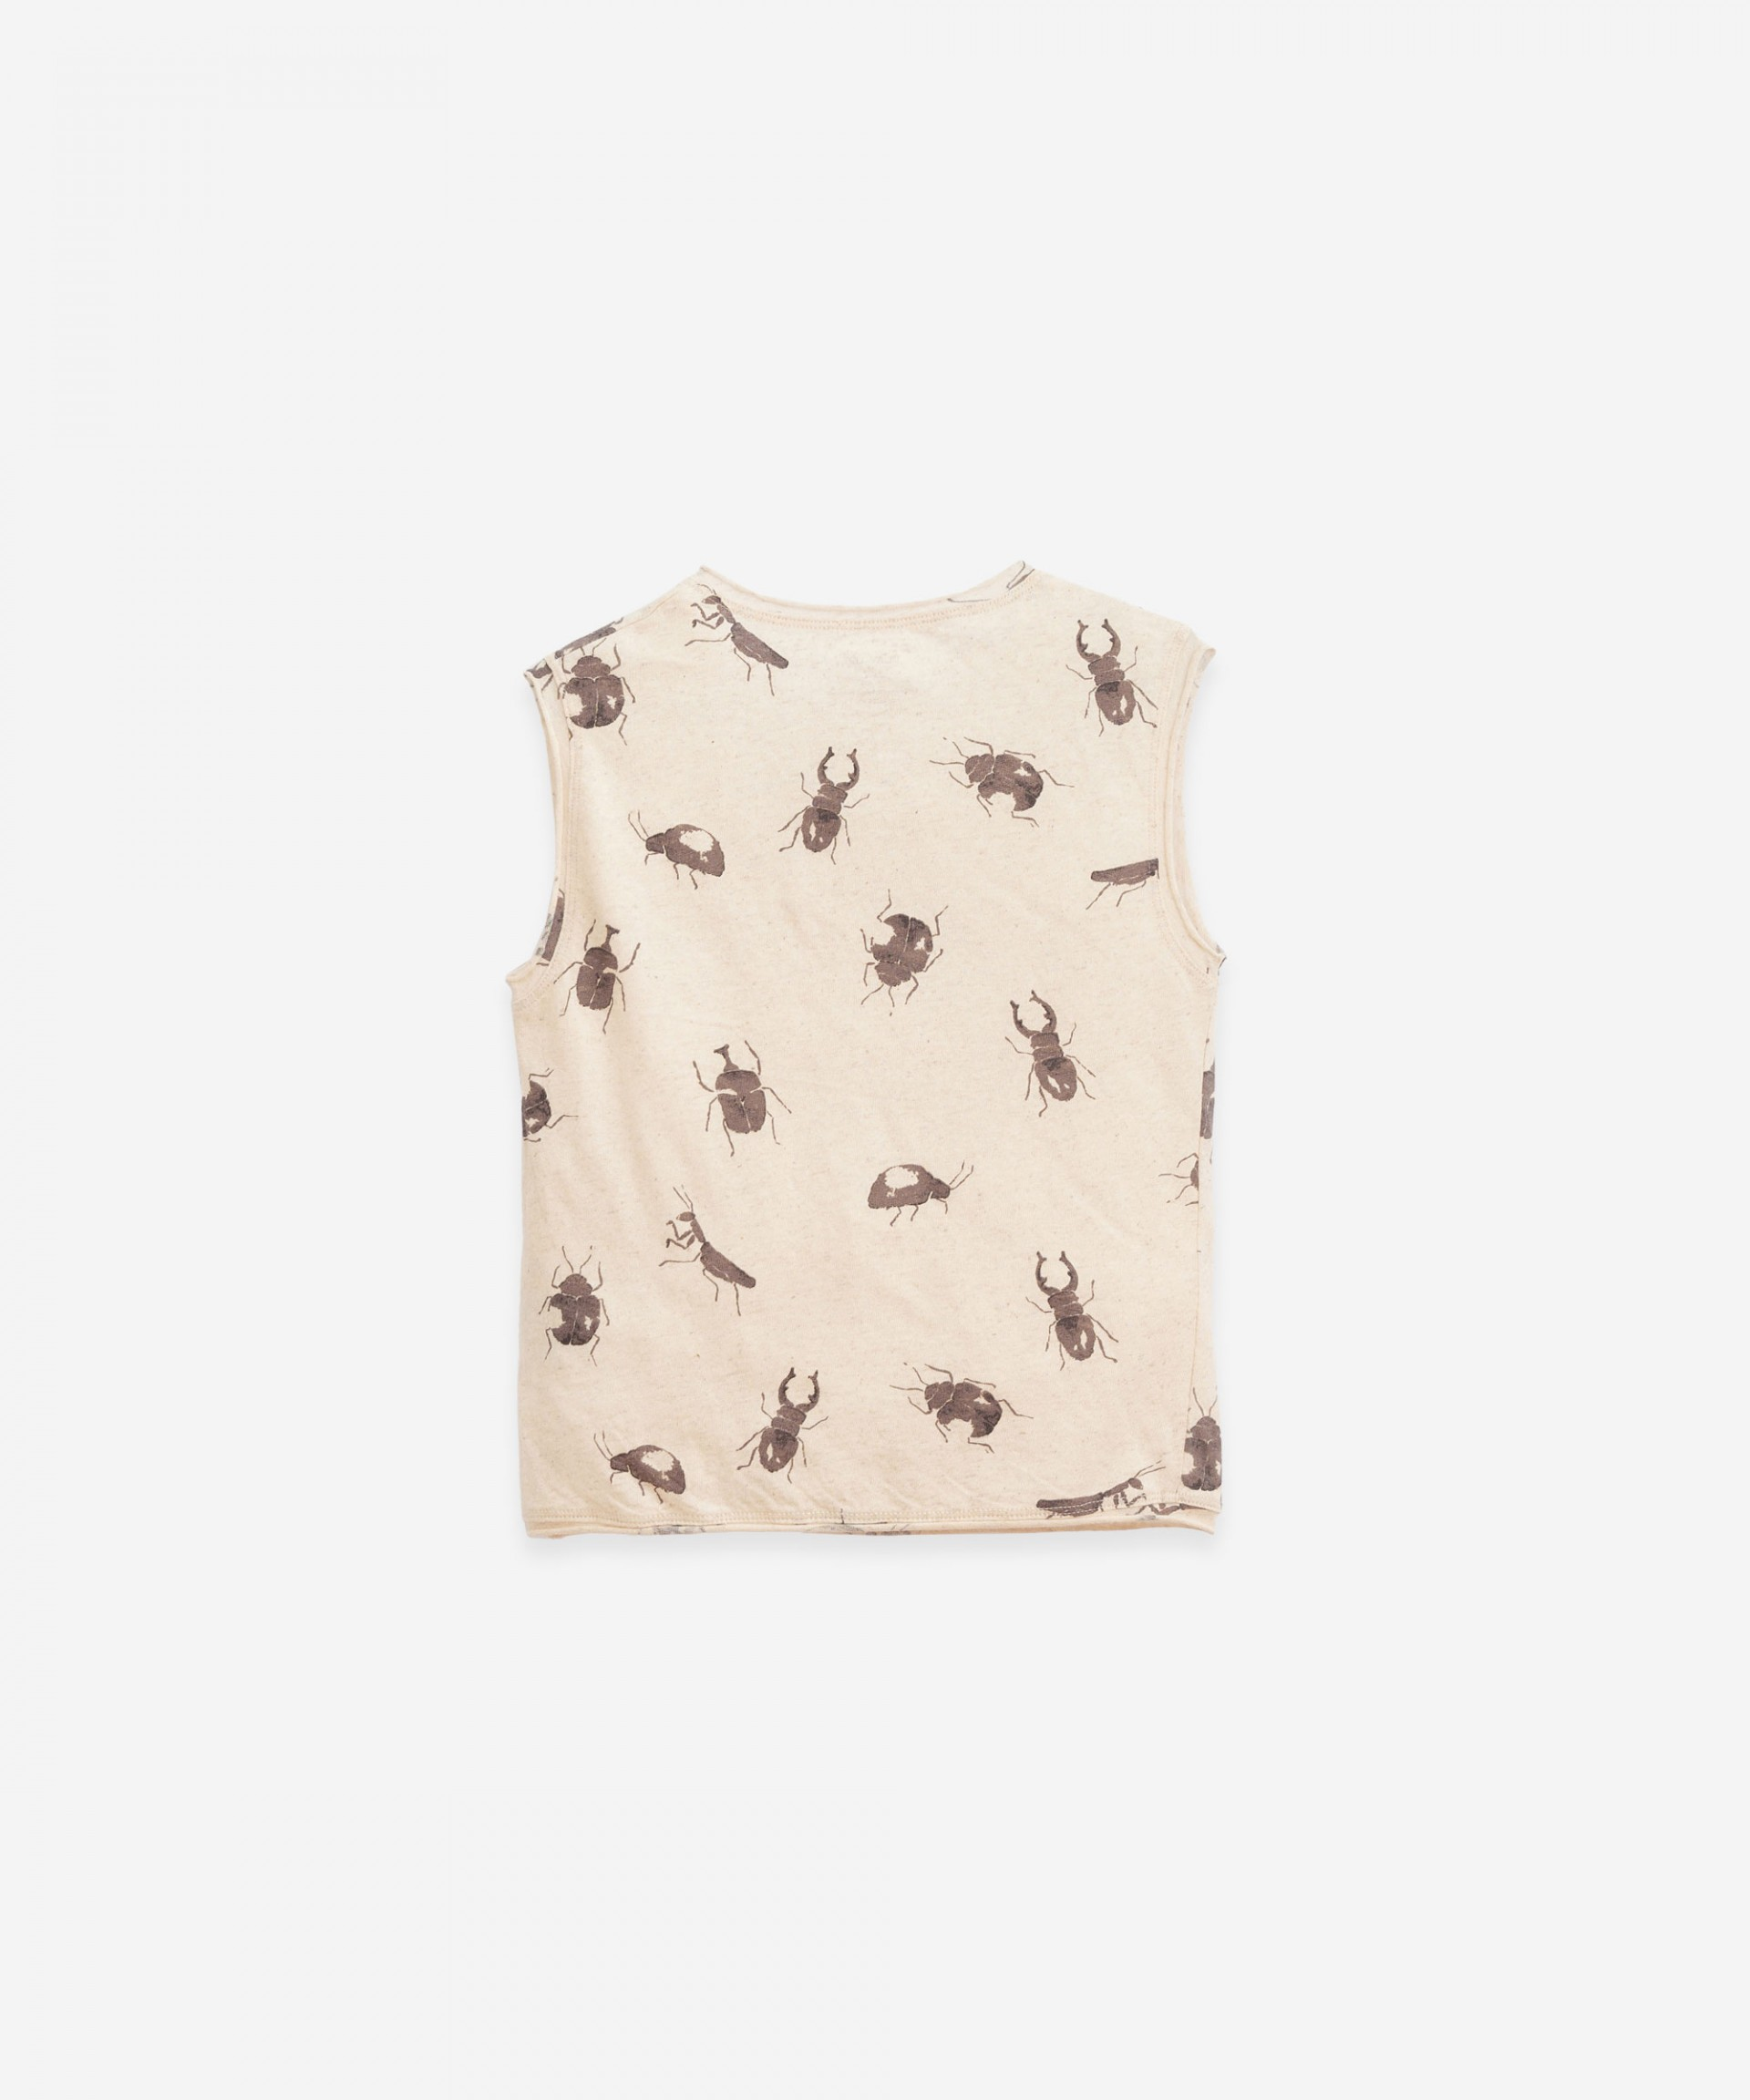 T-Shirt senza maniche con stampa | Botany